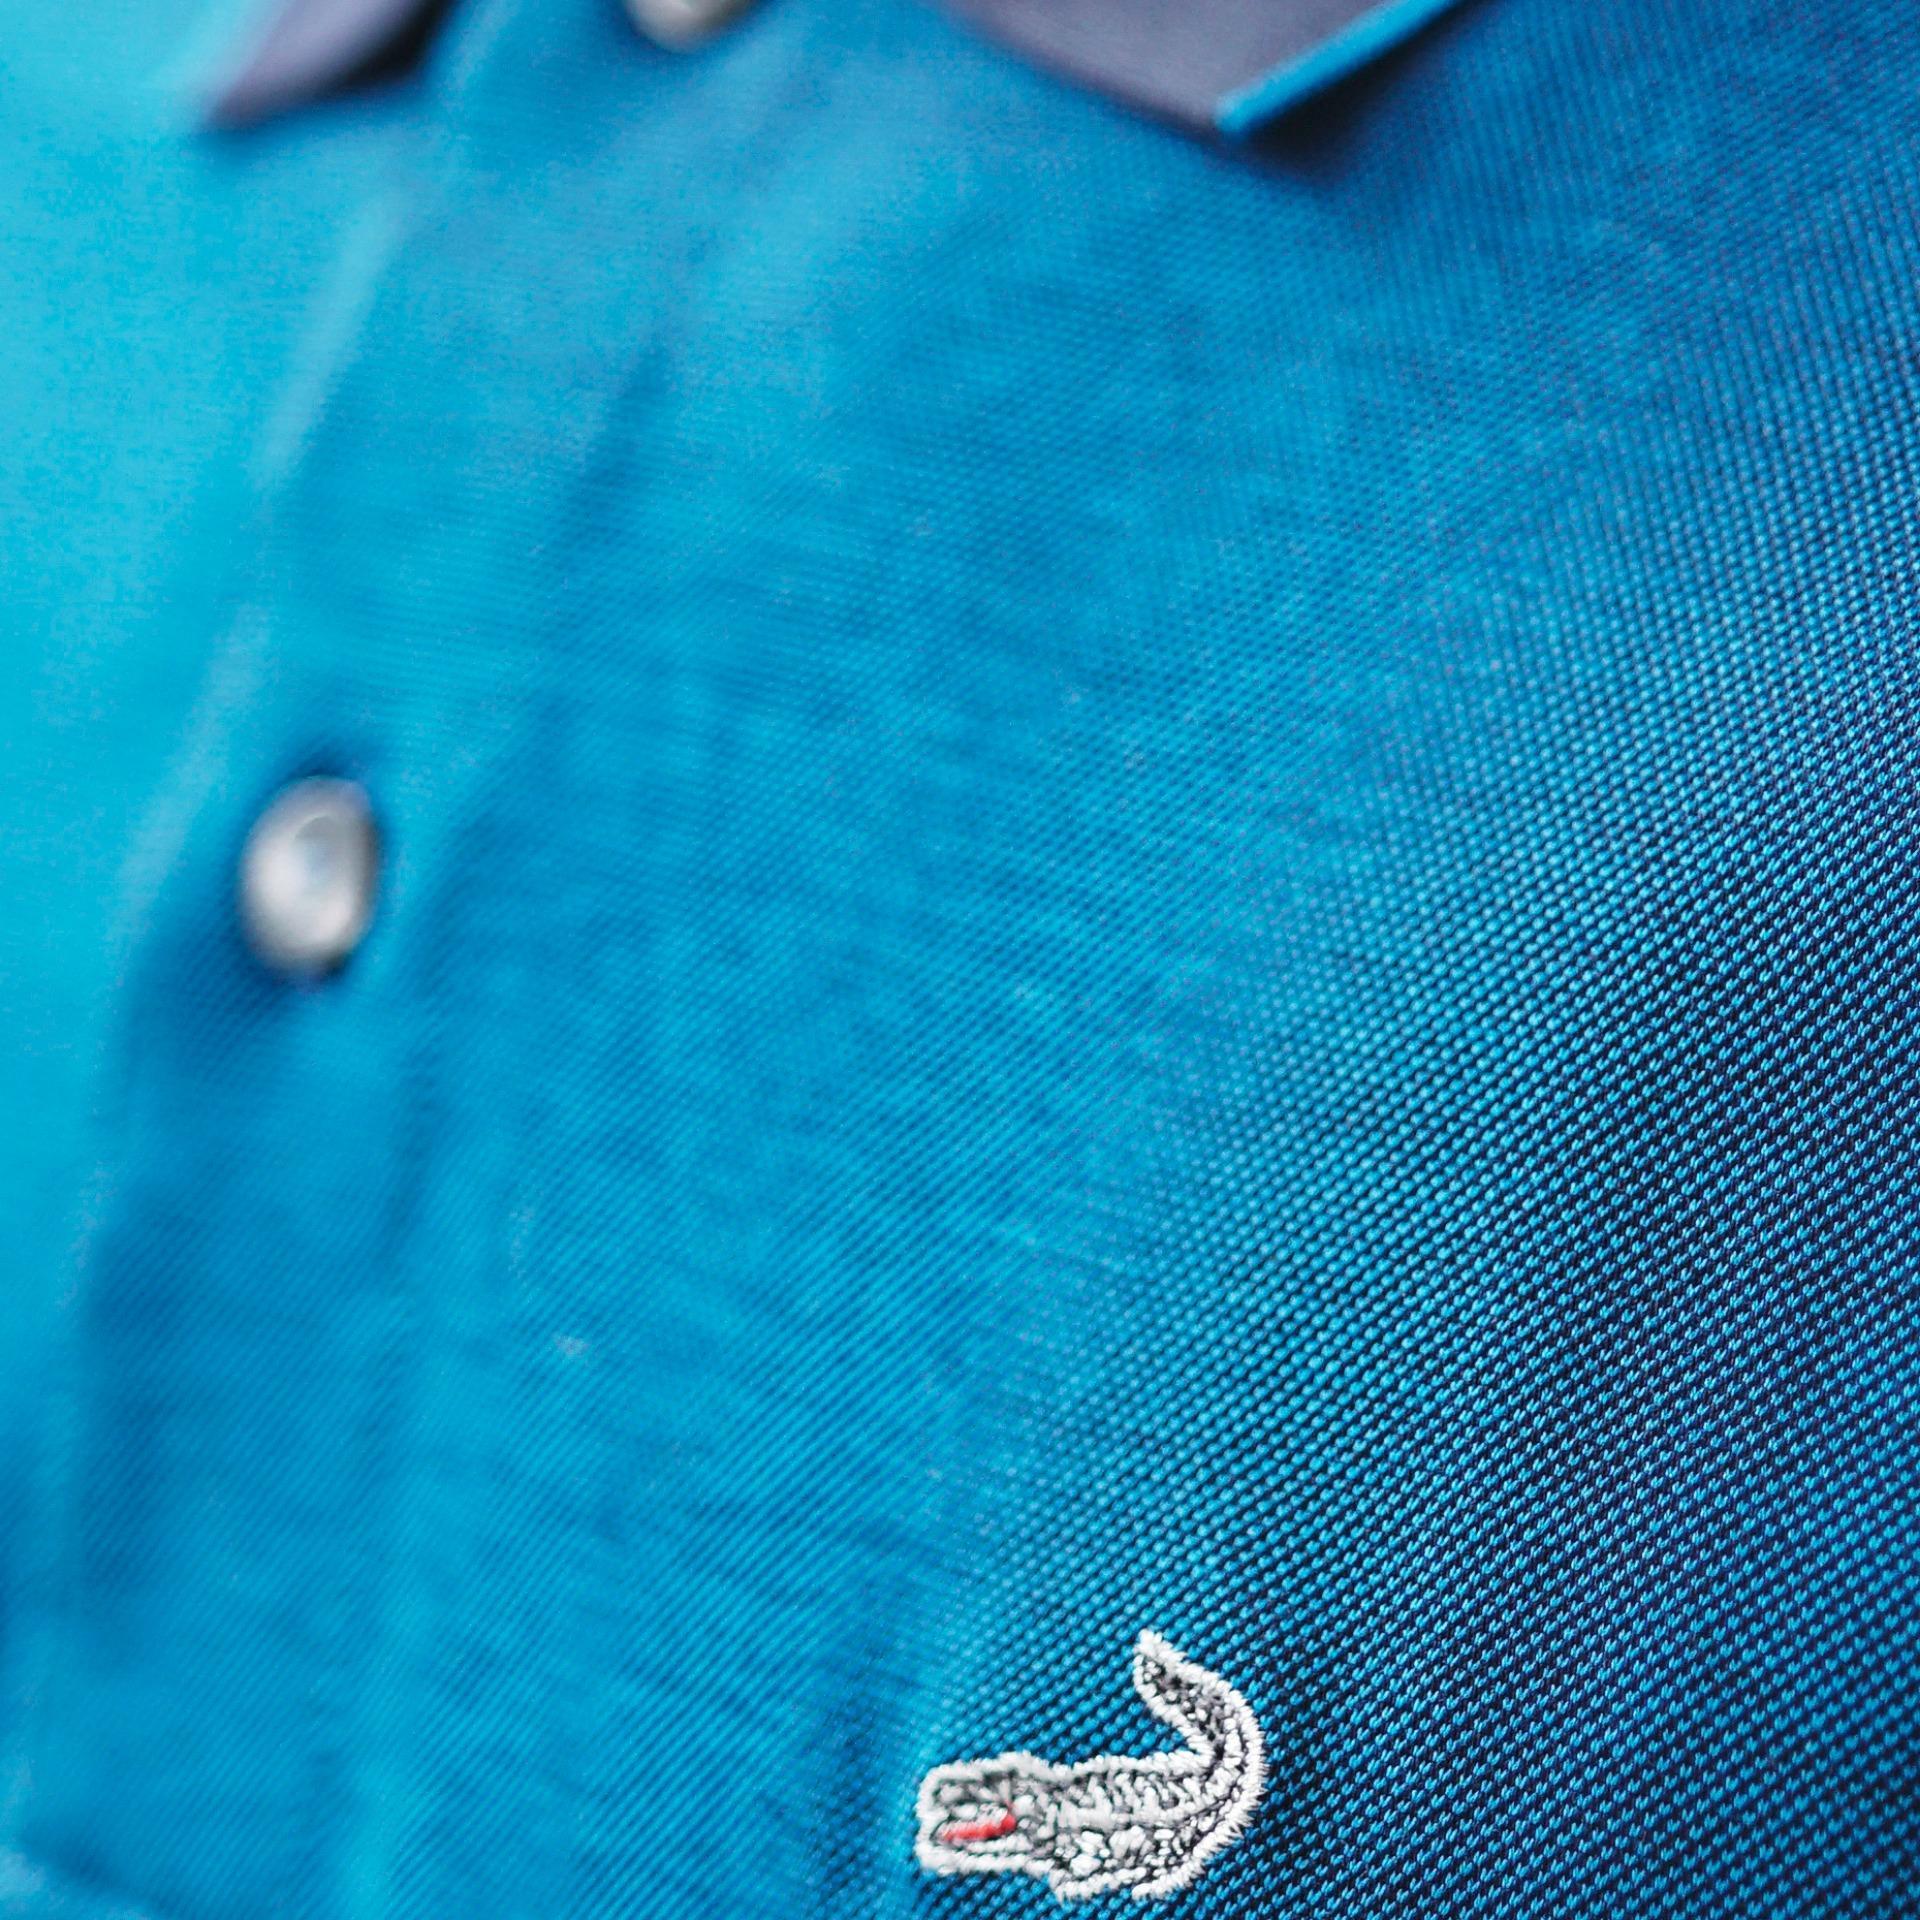 Baju Pria Crocodile Men Polo Shirt Slim Fit Bahan Katun 100percent Cole 2 Relax Sapphire Xl Premium 100 Cotton